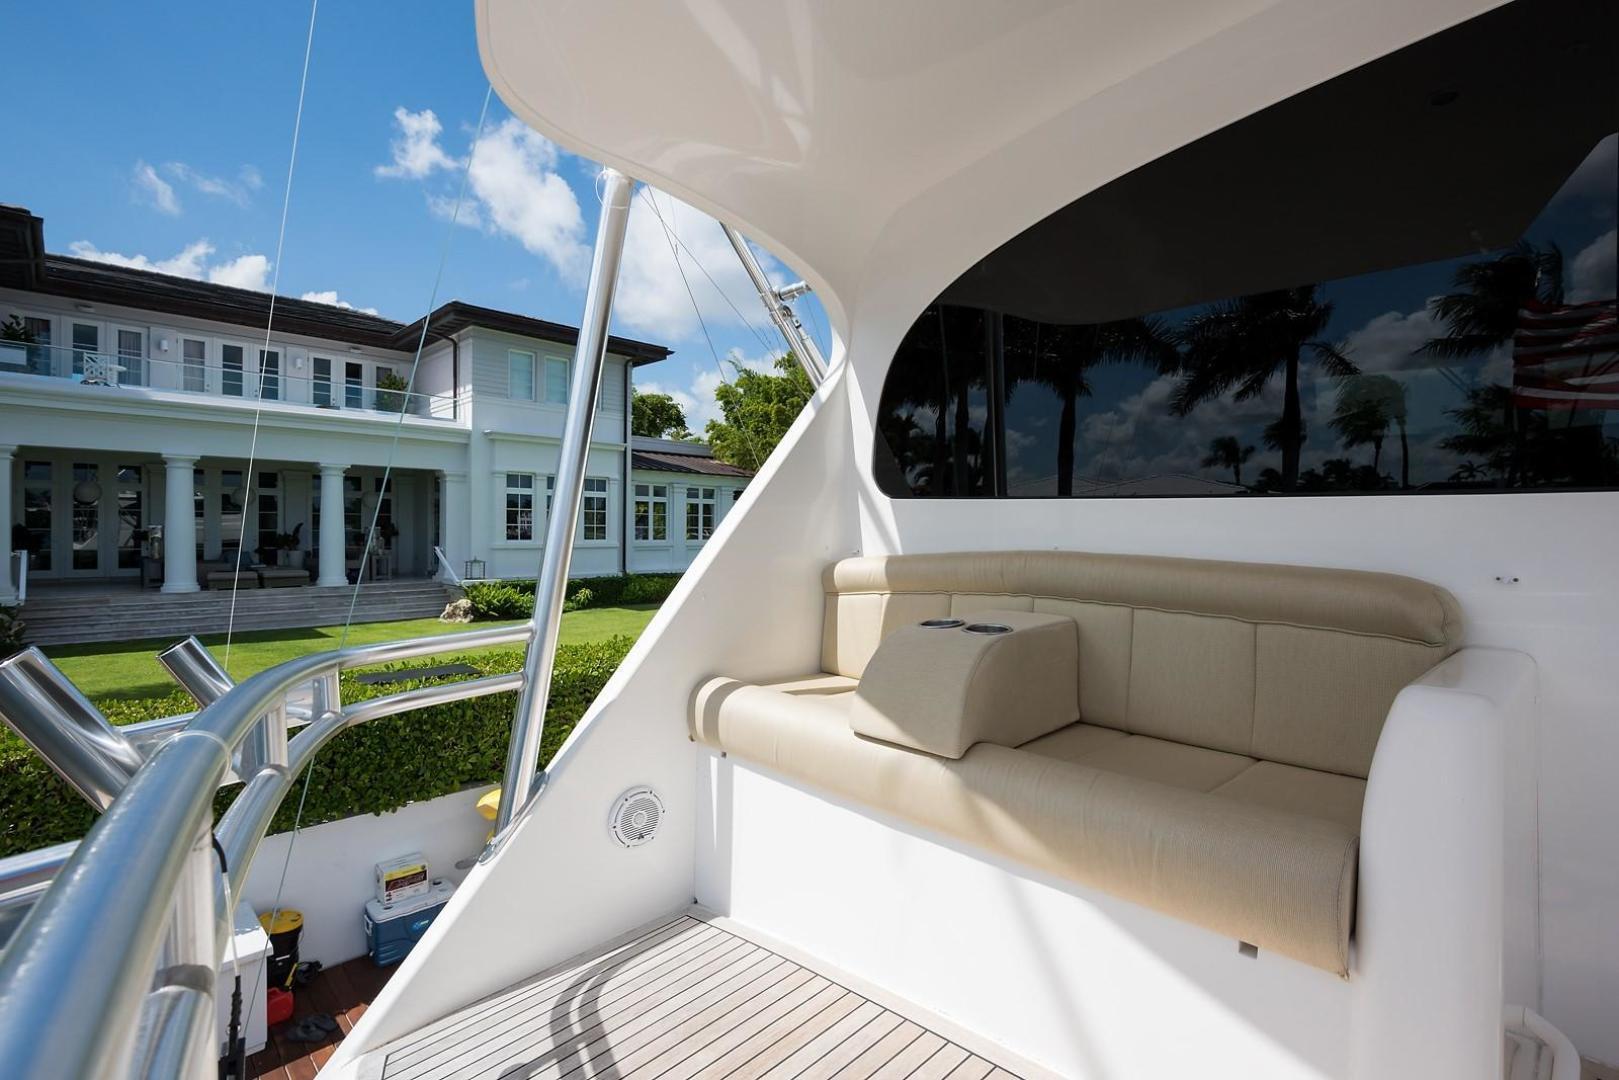 Viking-Enclosed 2013-No Name 82 Miami-Florida-United States-Enclosed Flybridge Aft Deck-1324721 | Thumbnail